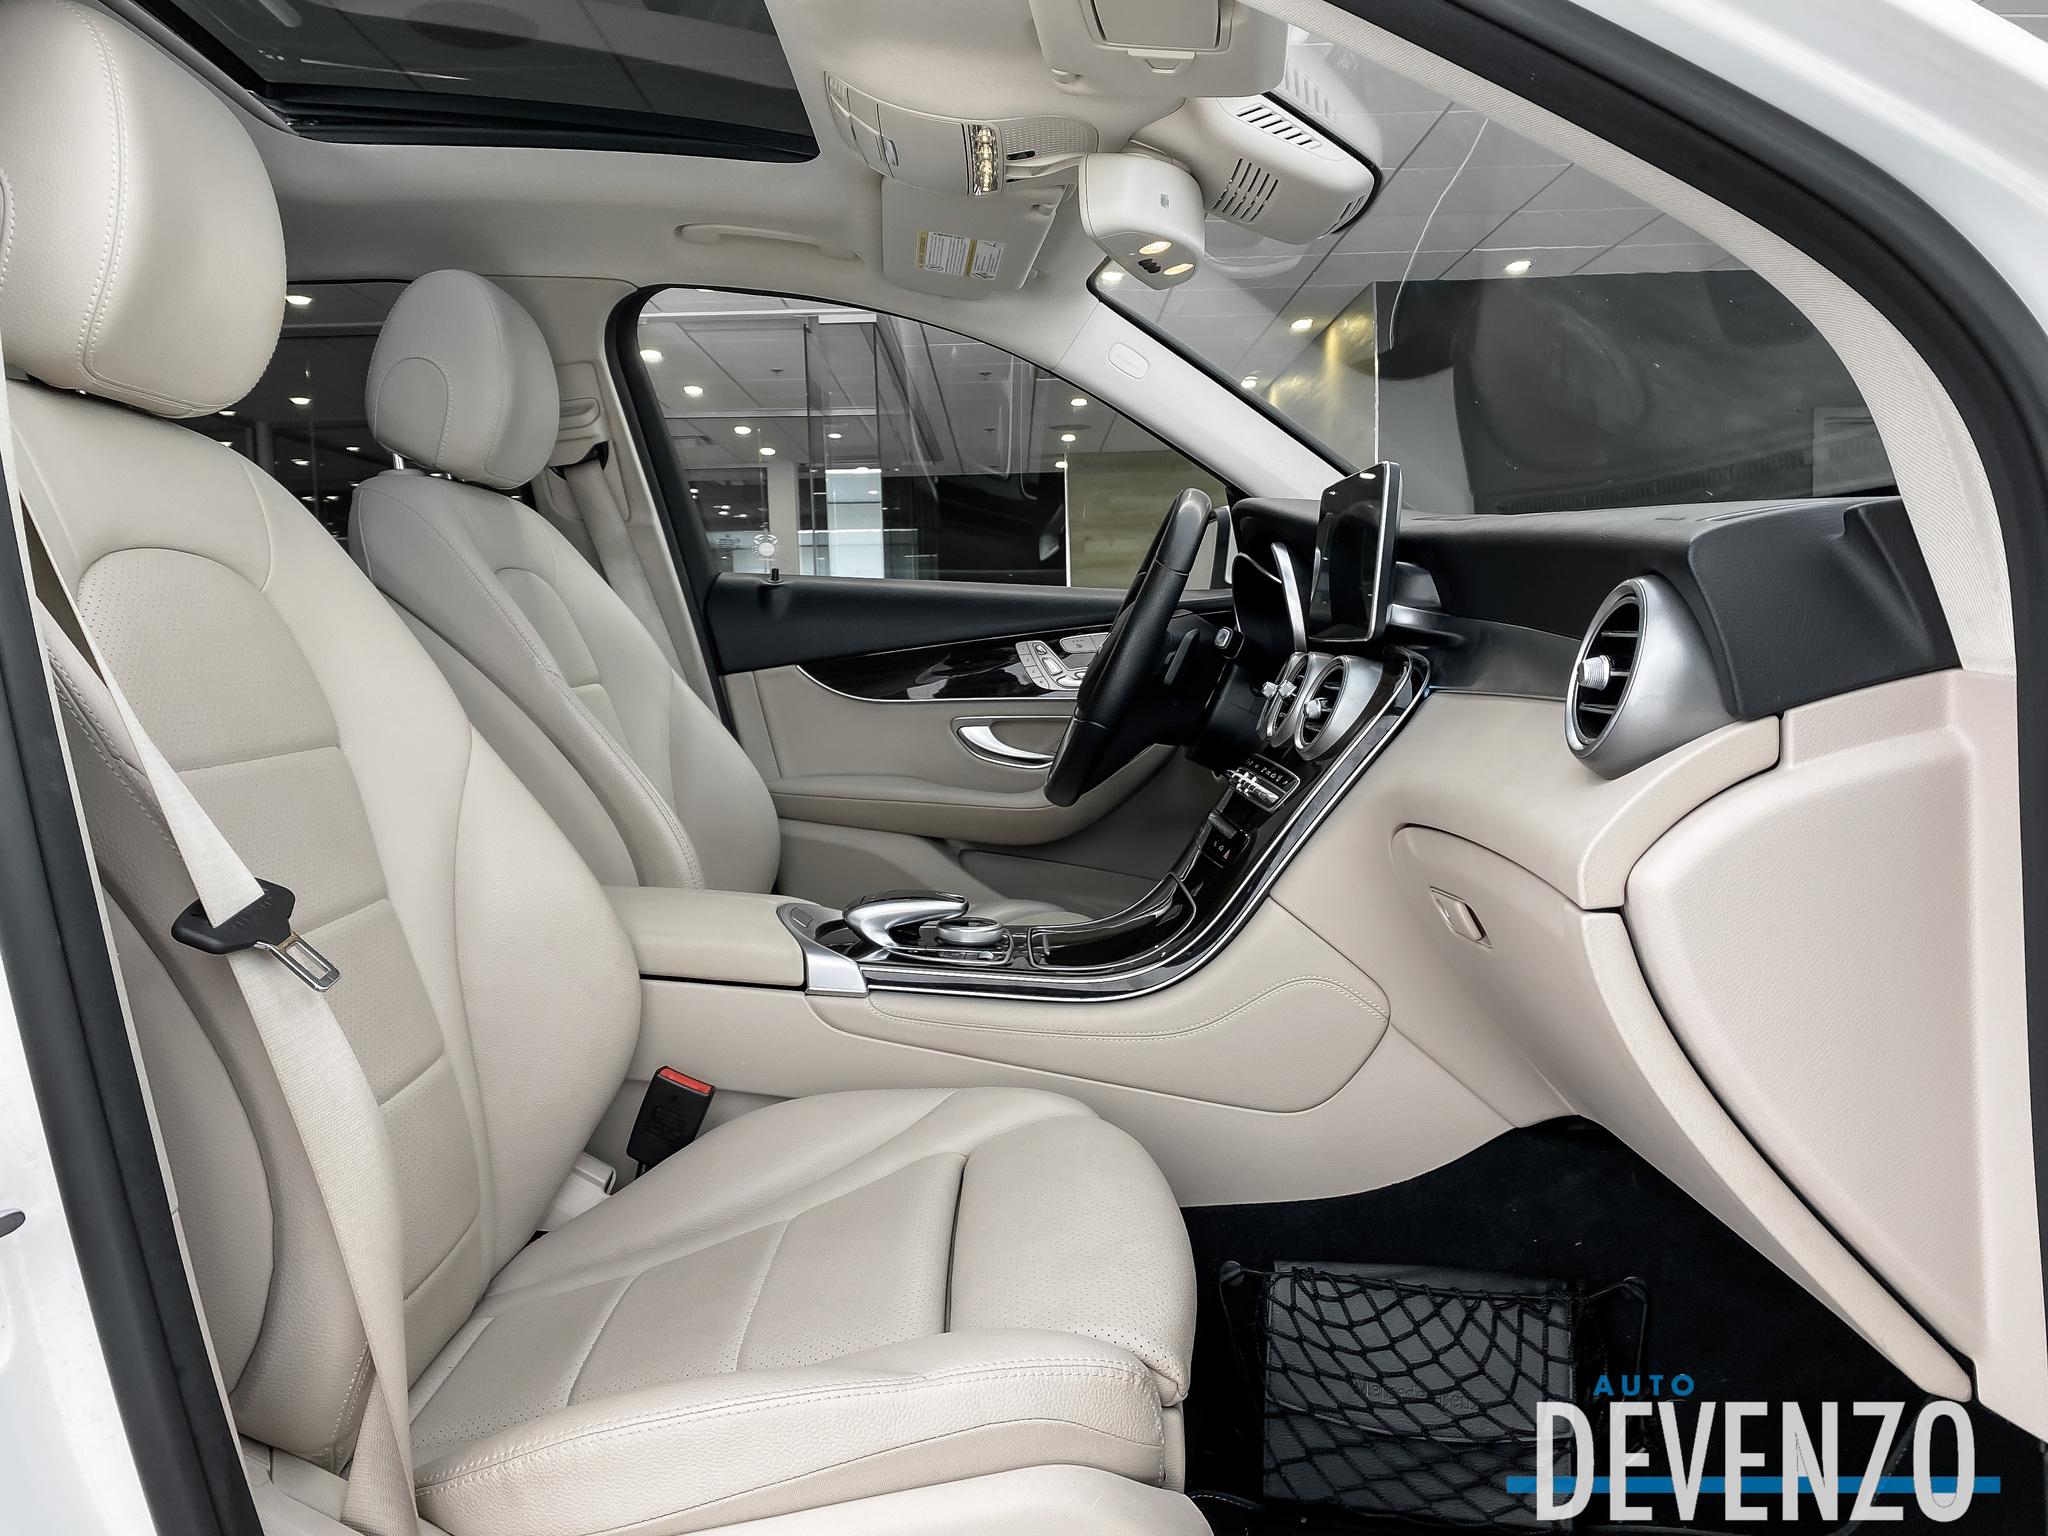 2017 Mercedes-Benz GLC 4MATIC GLC300 Premium / LED / Navi / Toit / Camera complet